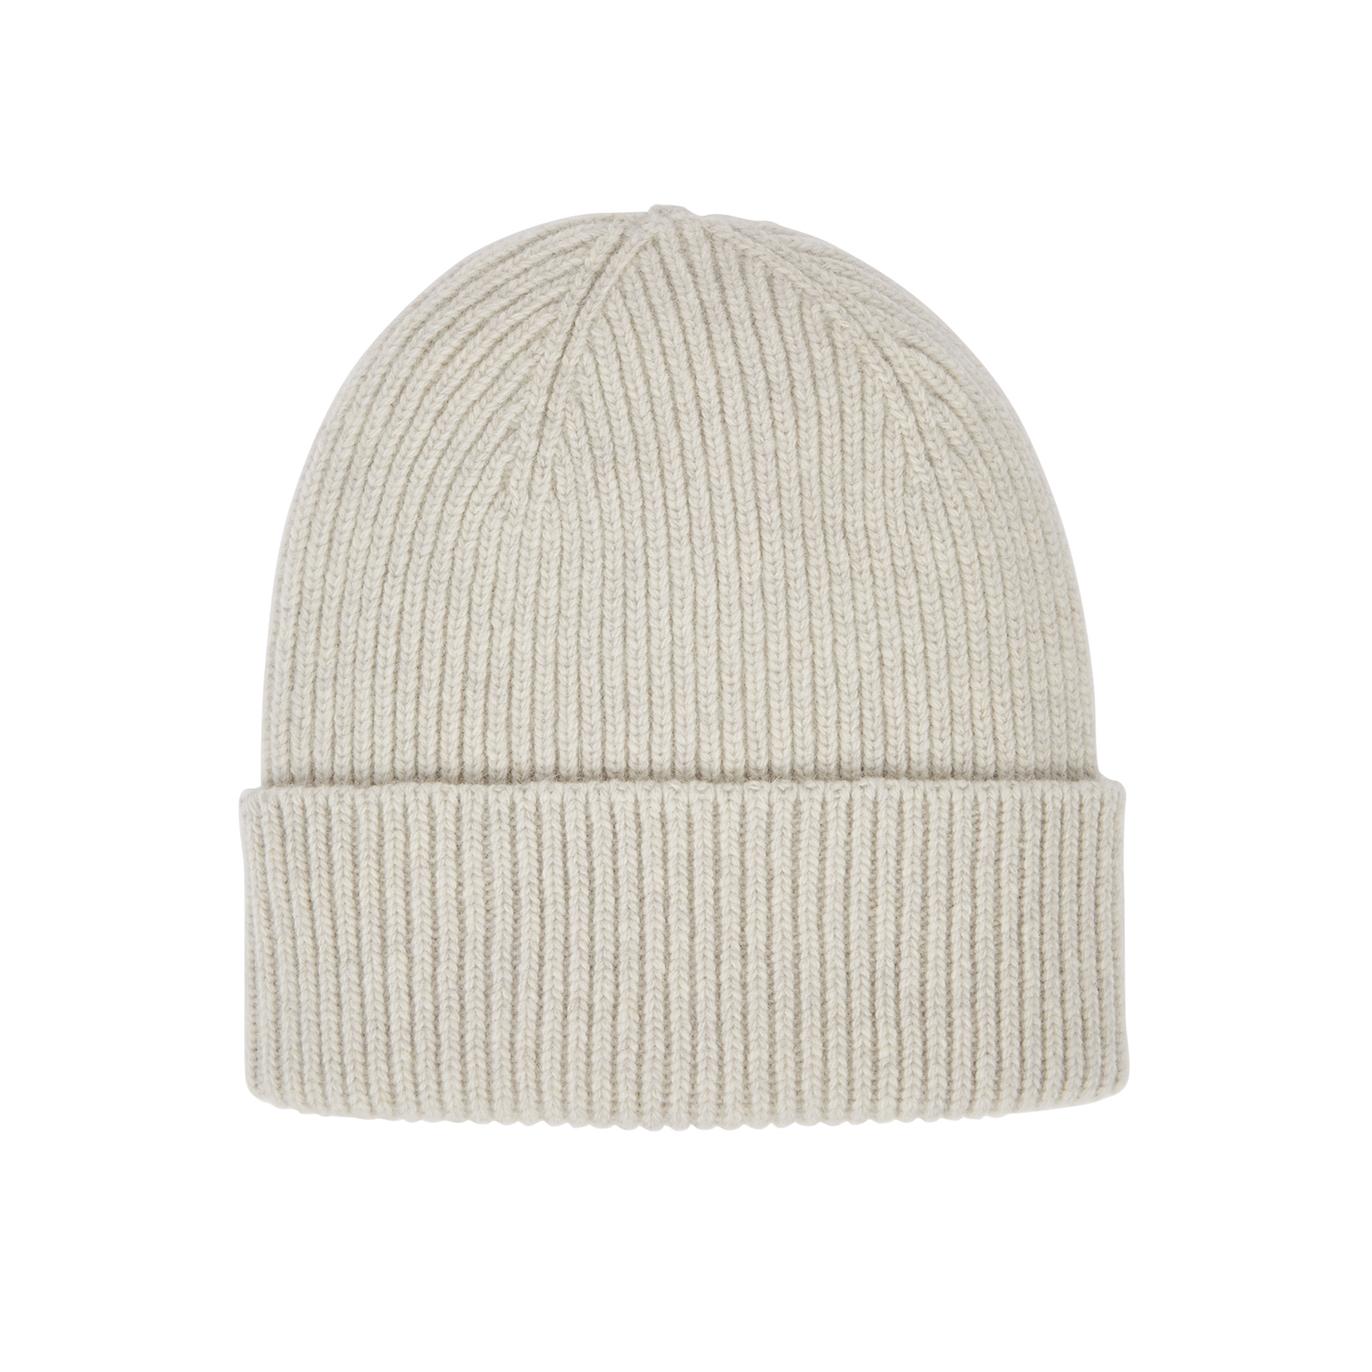 d72adc05d Light-grey knitted merino wool beanie